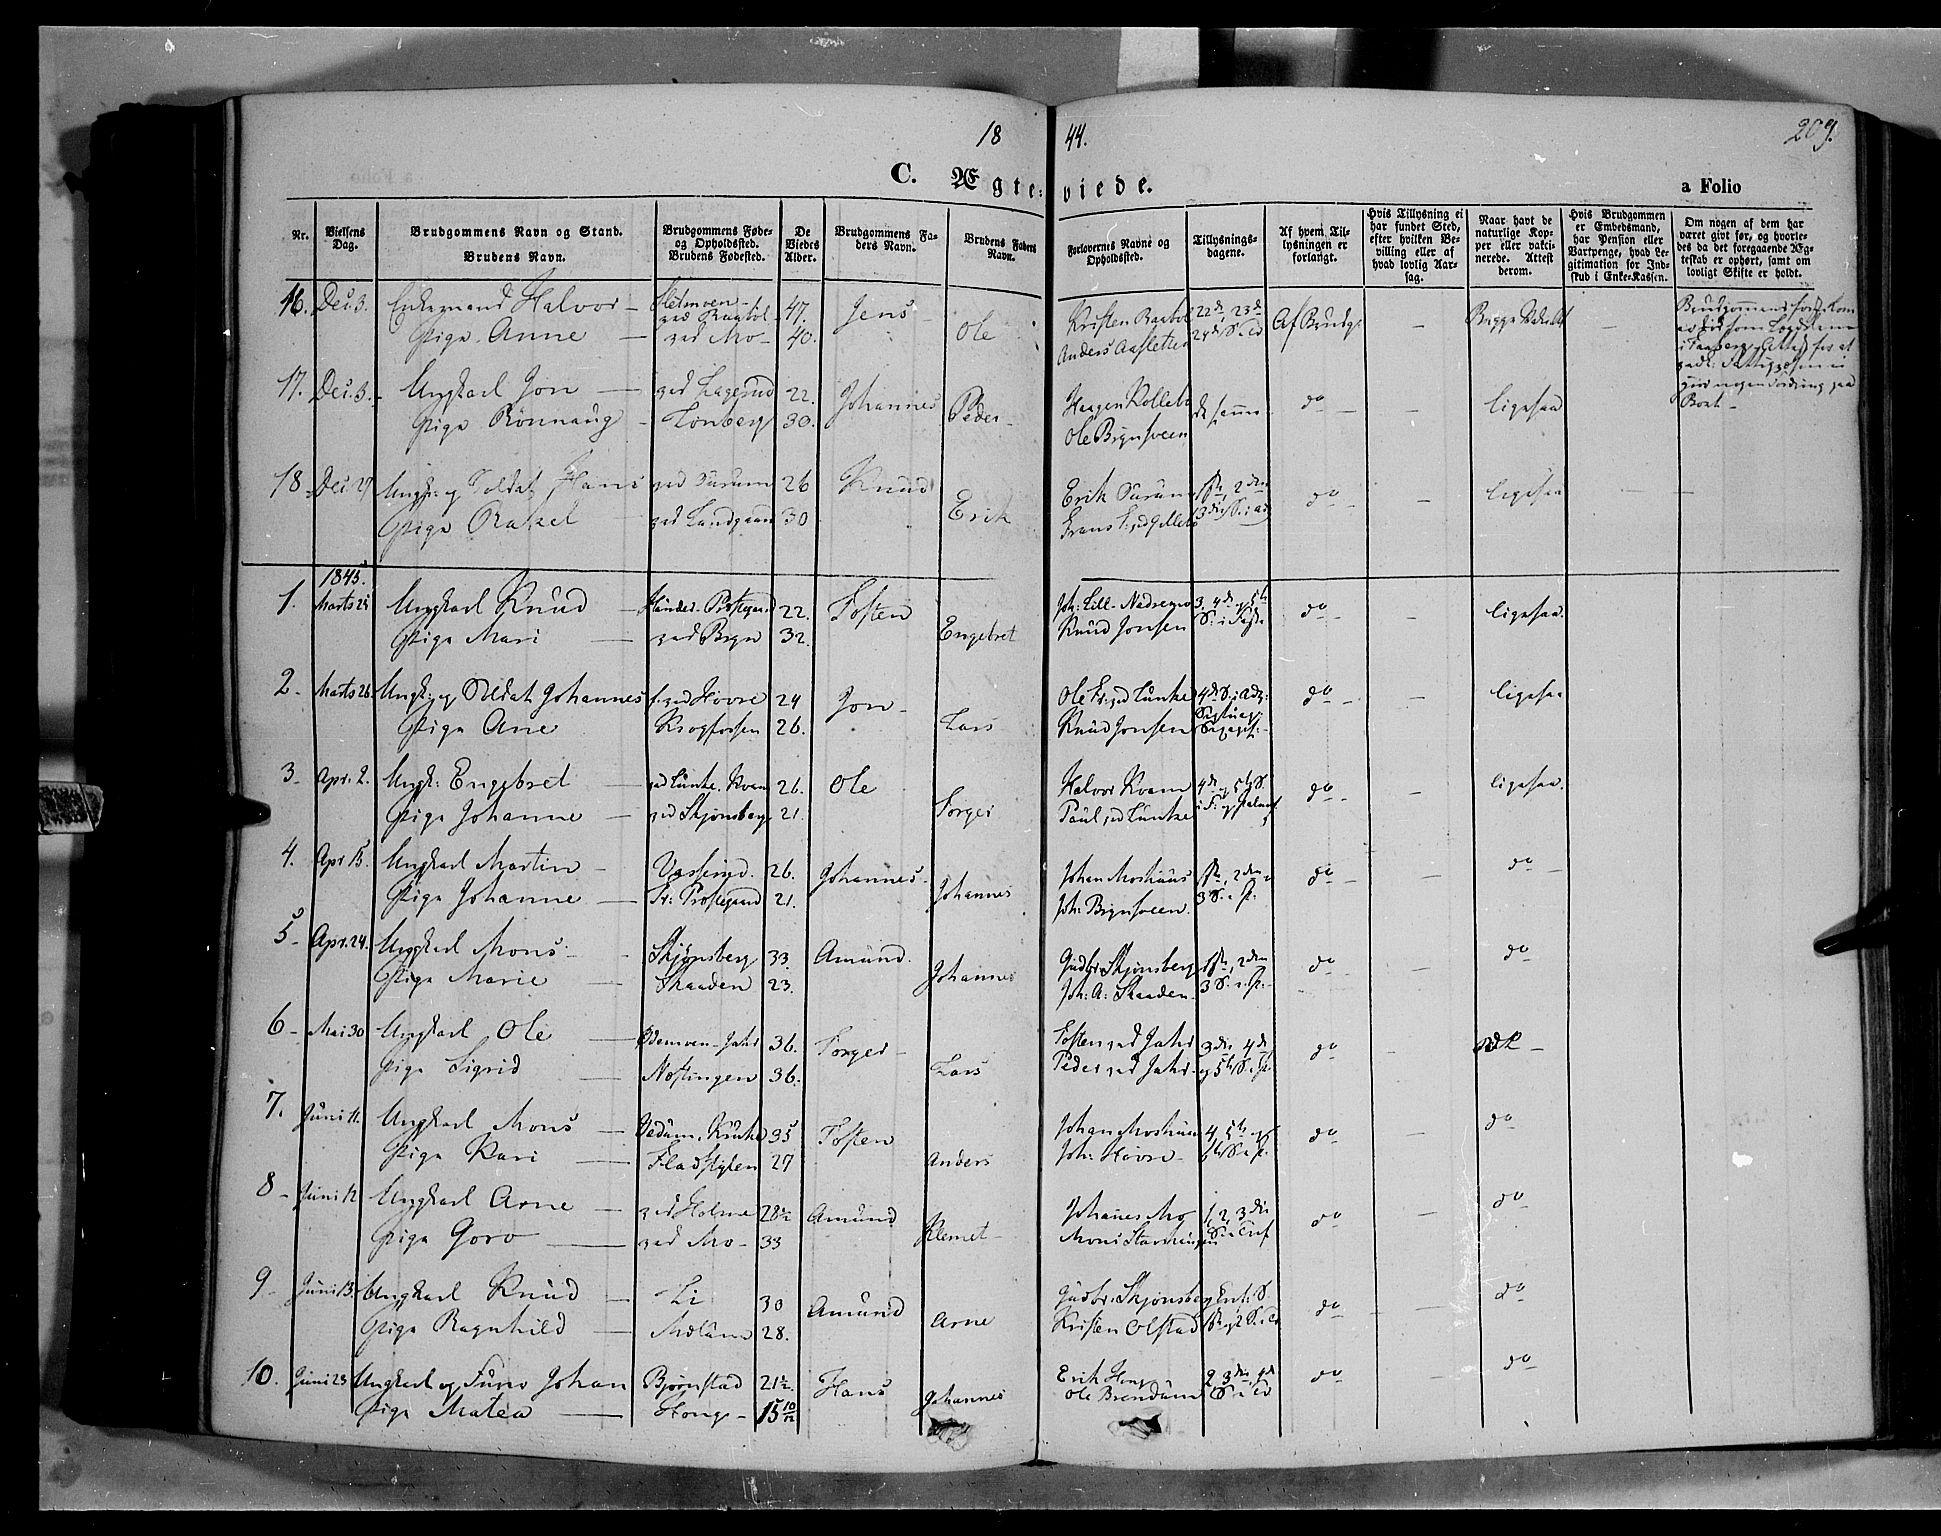 SAH, Øyer prestekontor, Ministerialbok nr. 5, 1842-1857, s. 209